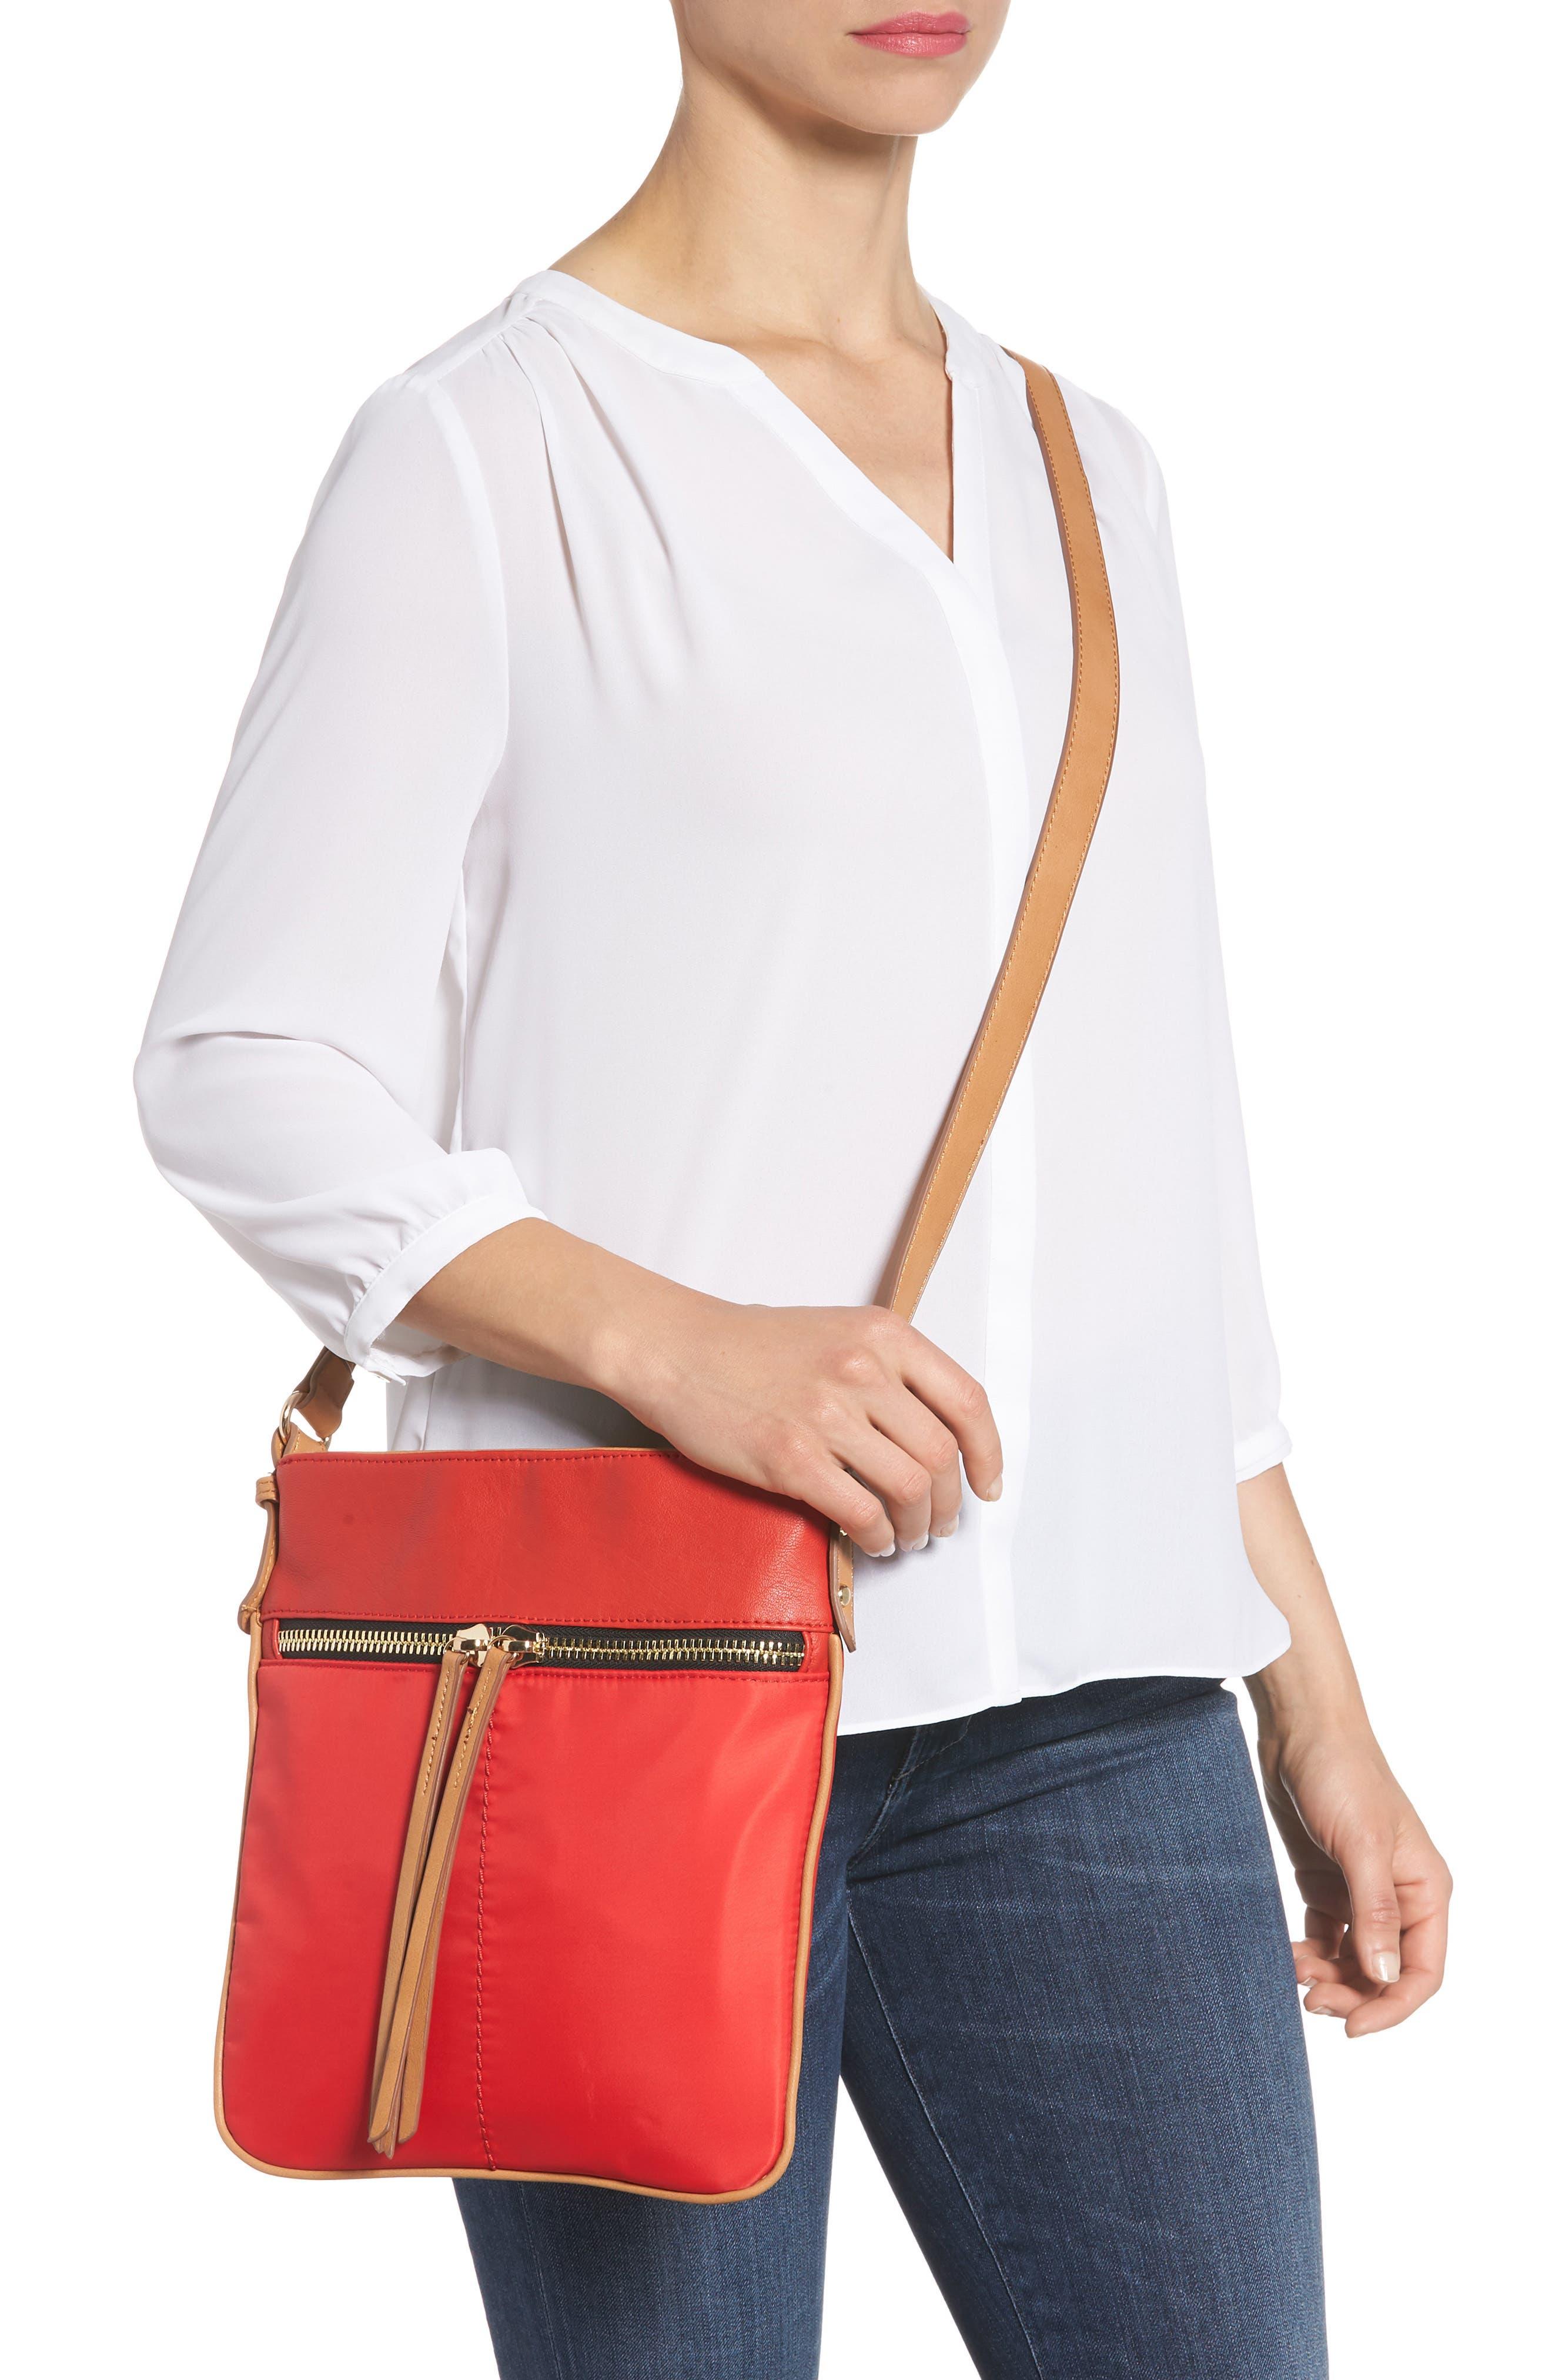 Nylon & Faux Leather Crossbody Bag,                             Alternate thumbnail 2, color,                             600